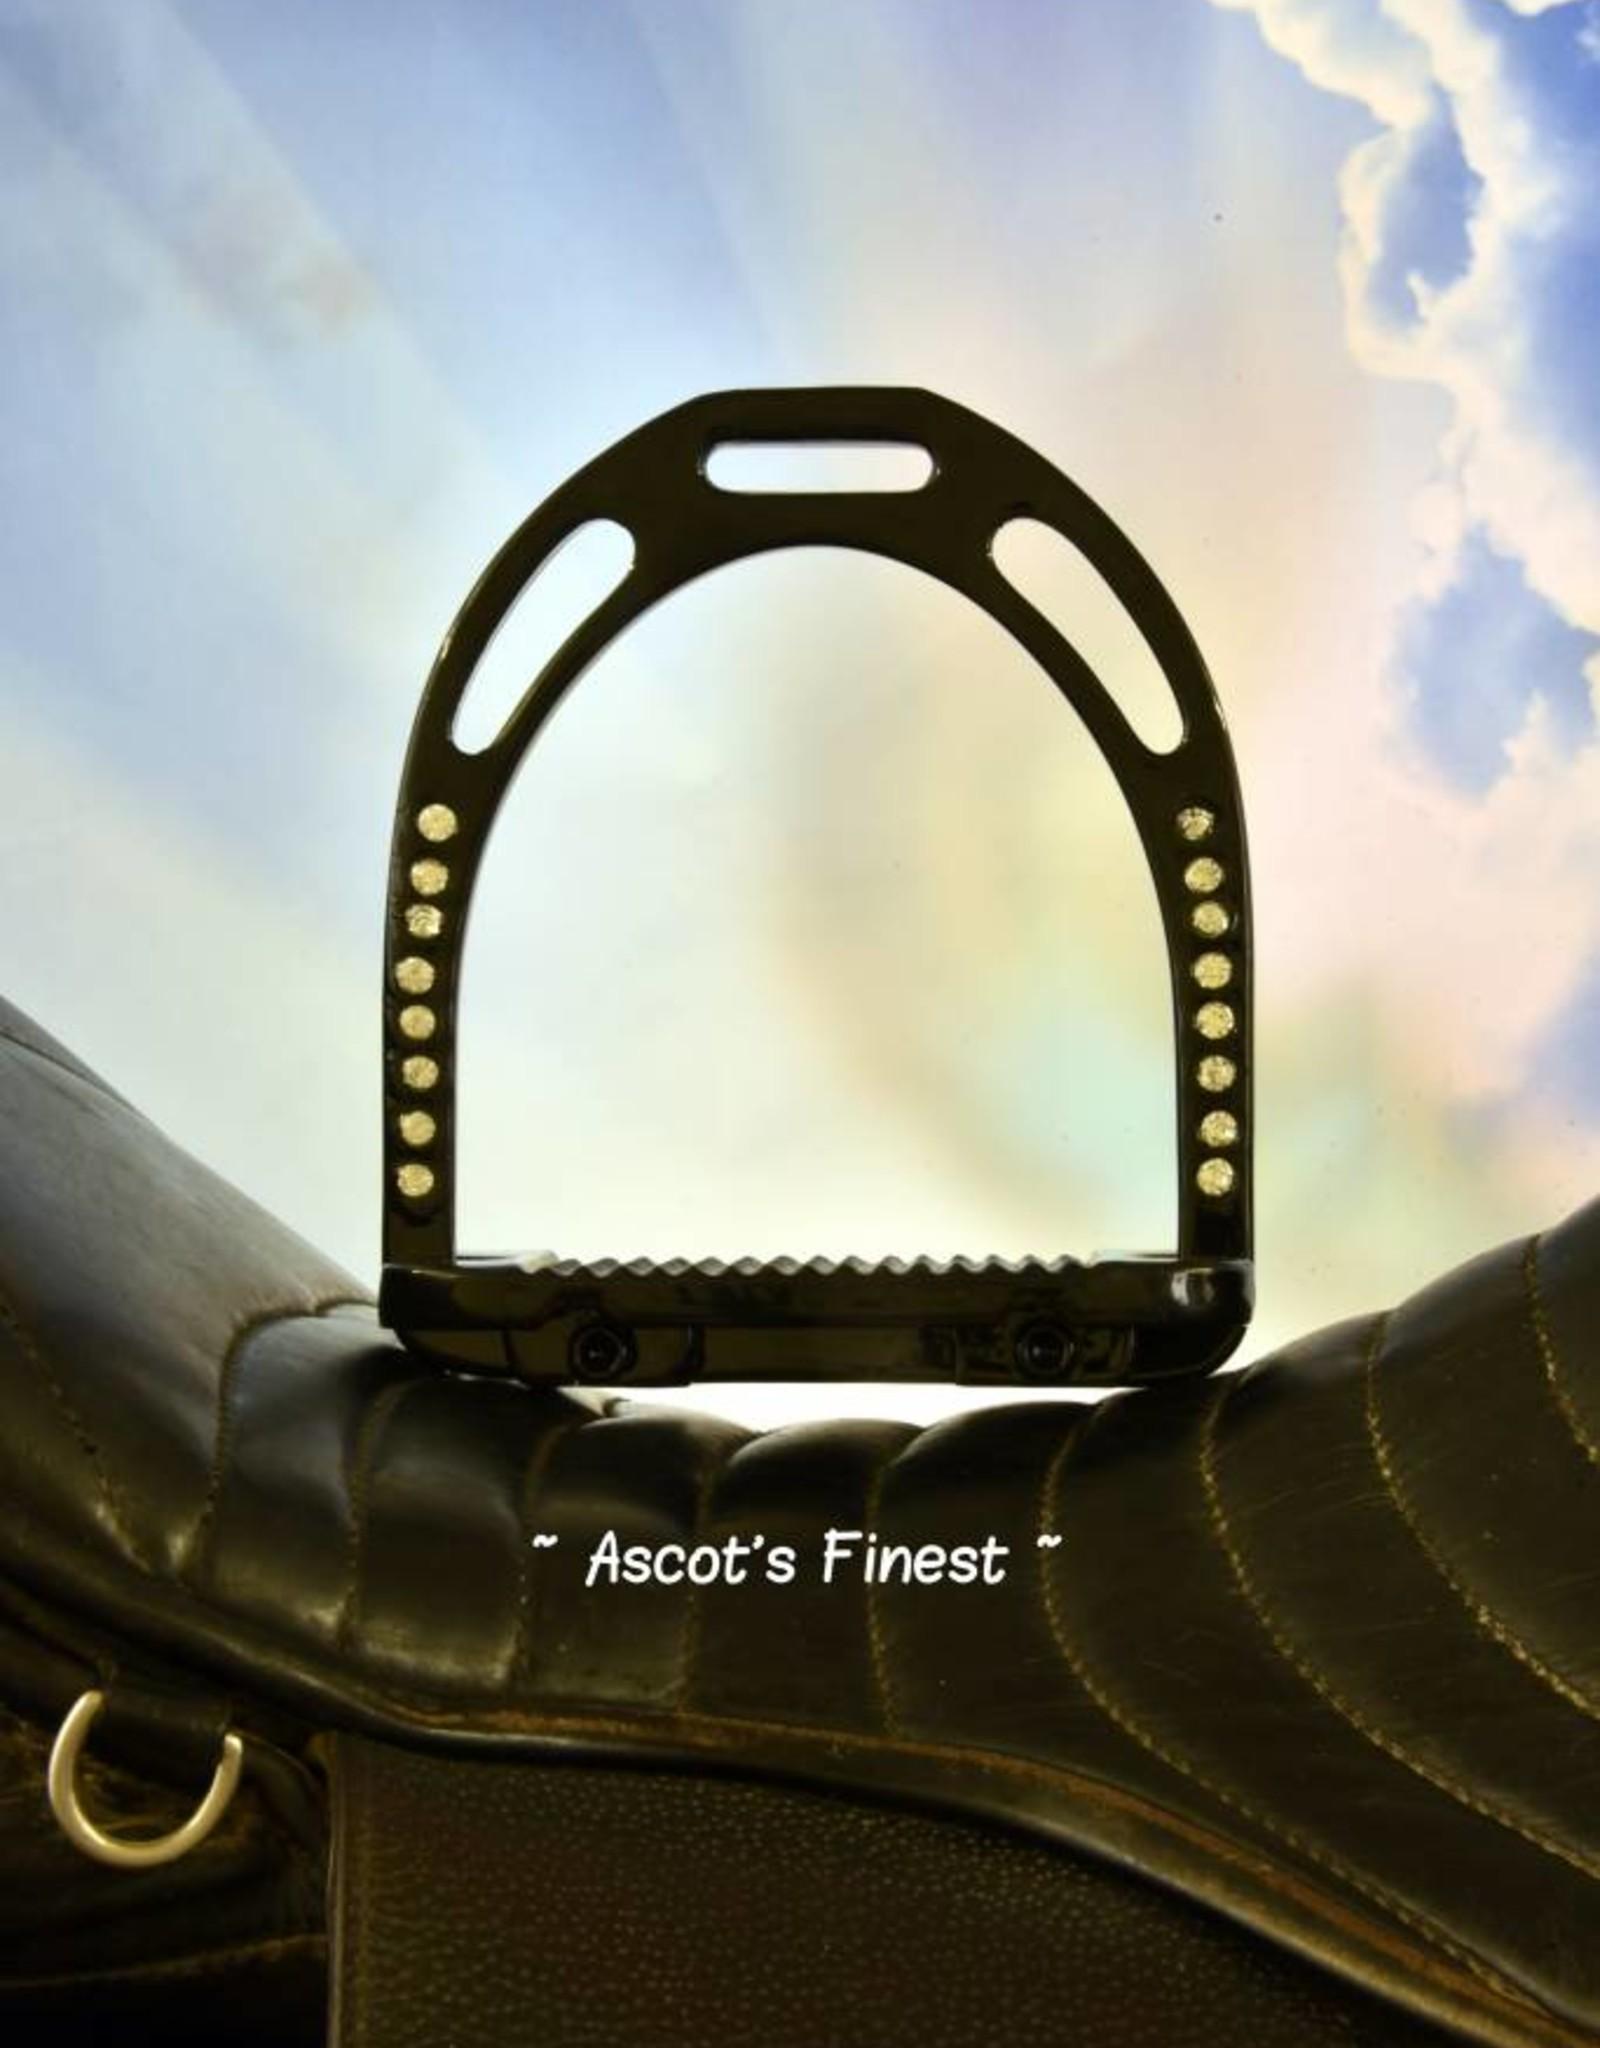 Ascot's Finest Zwarte brede stijgbeugels